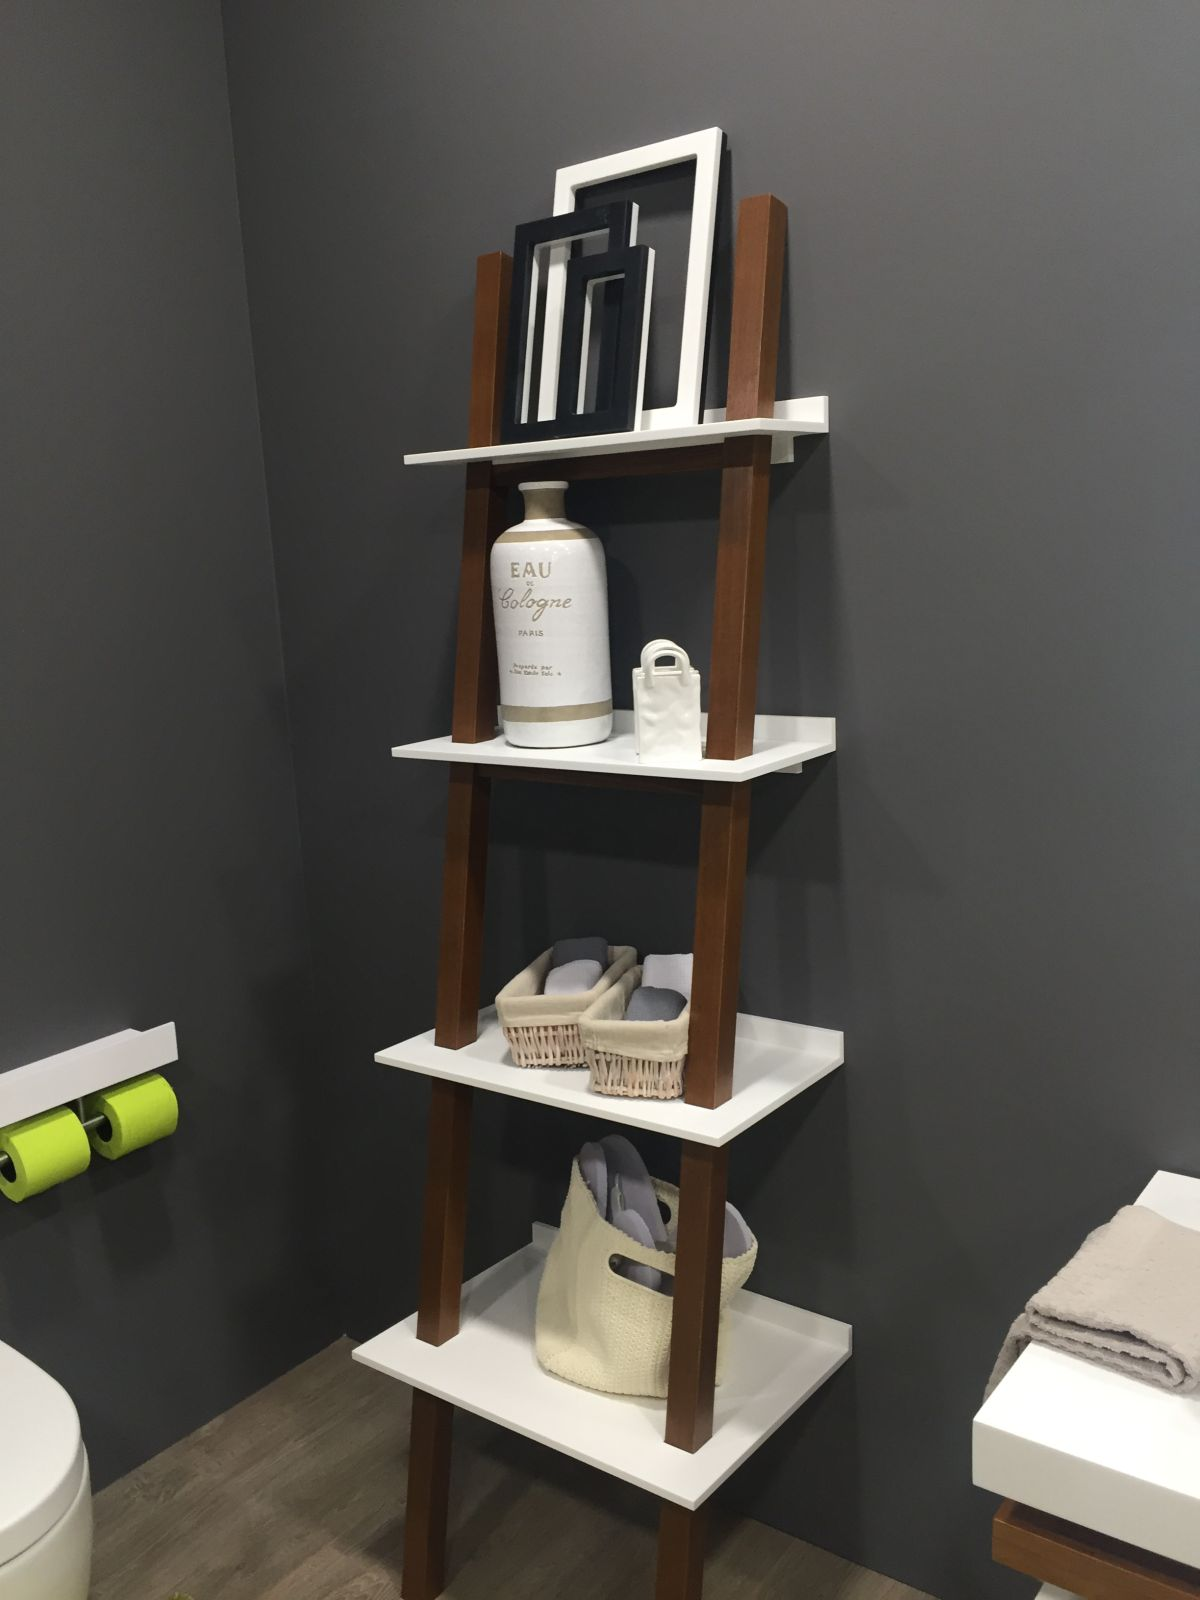 Ladder shelves system for bathroom